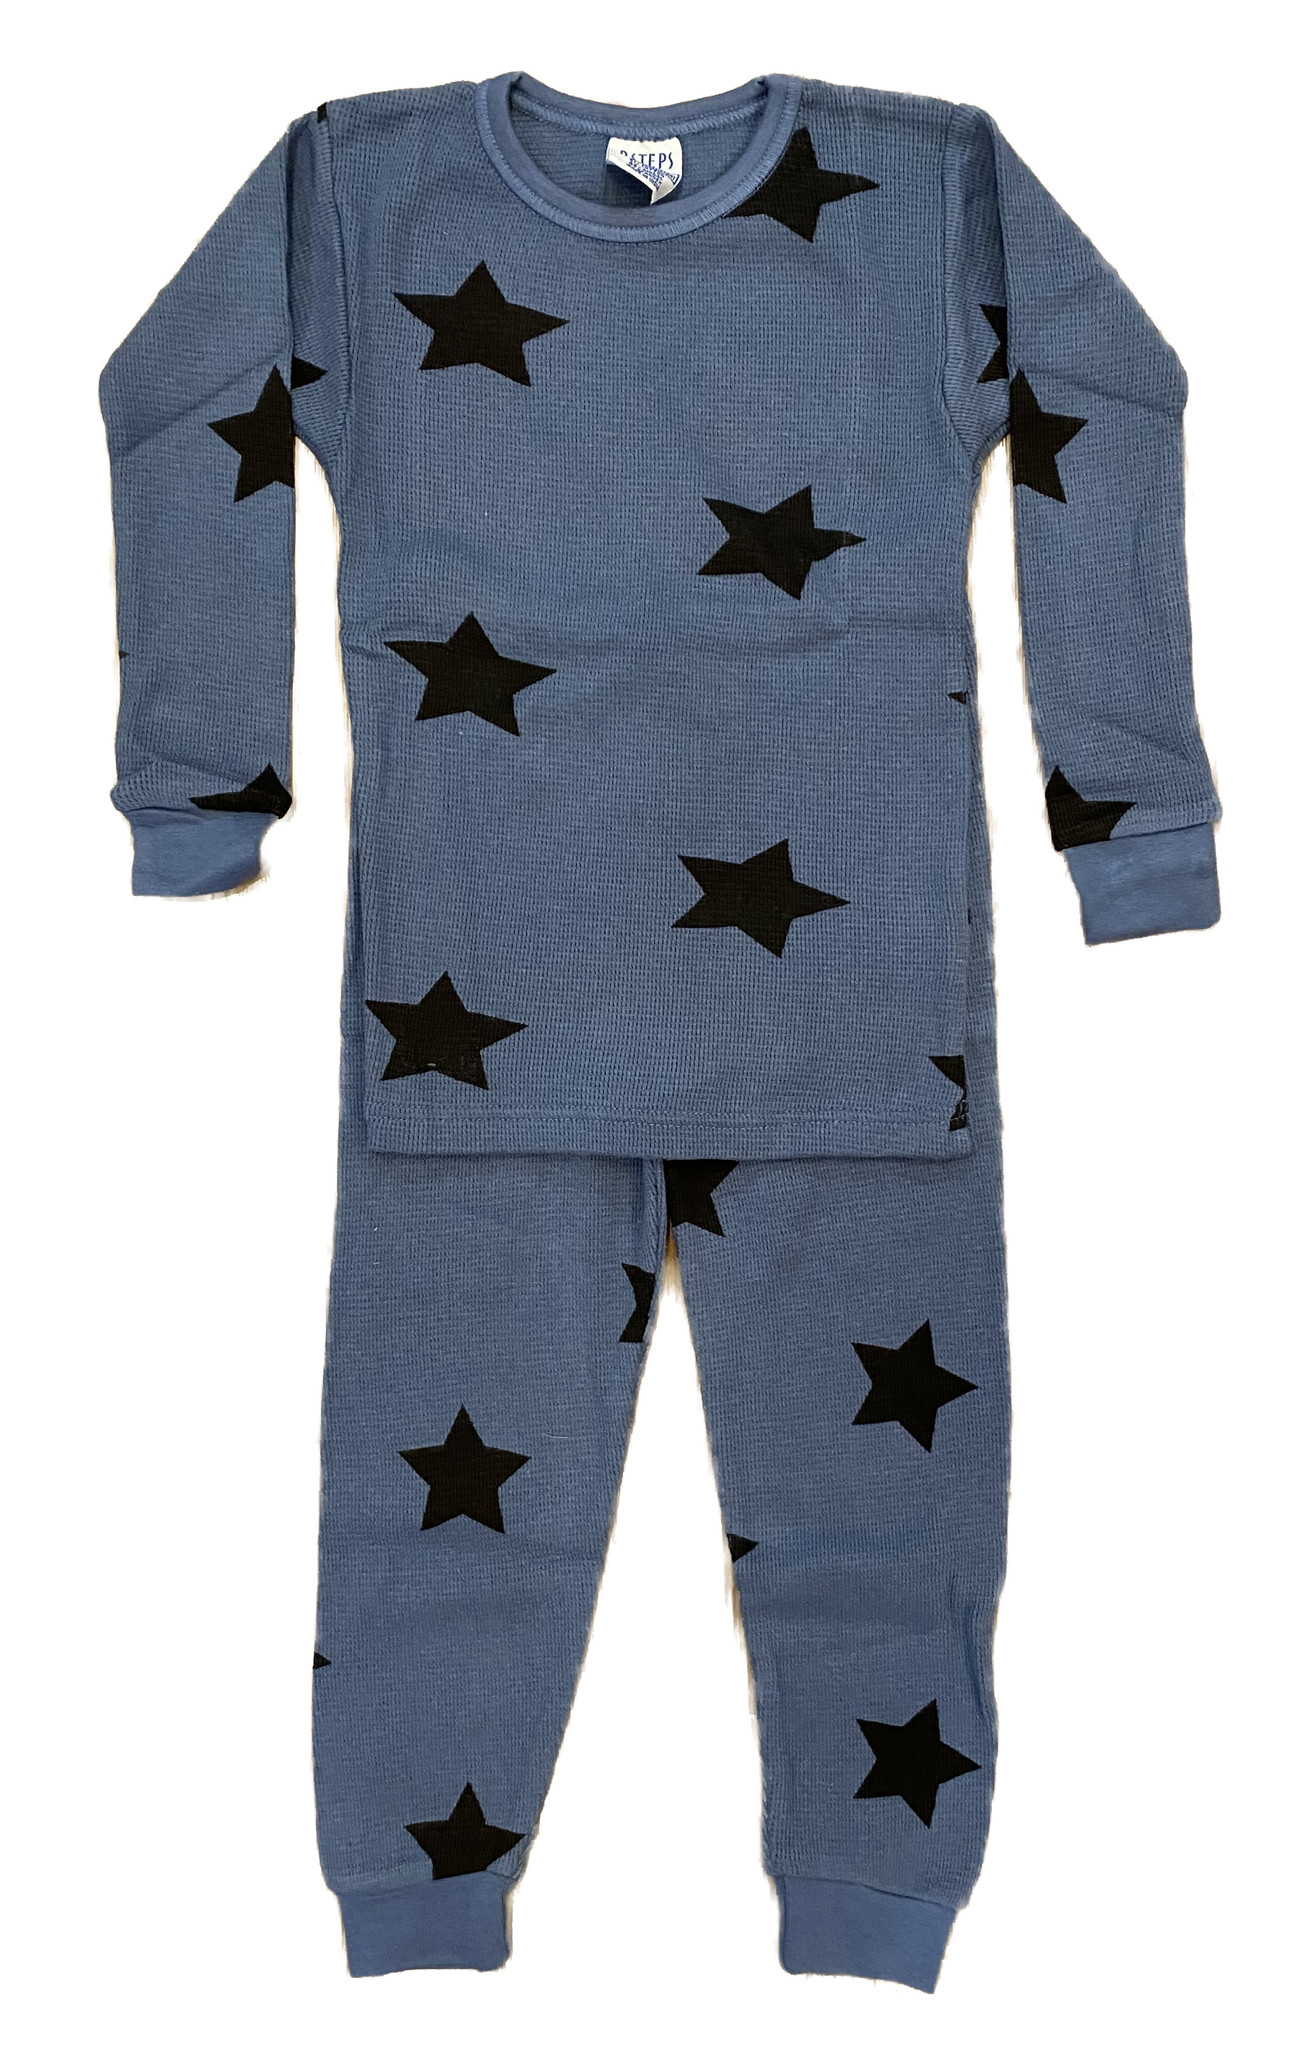 Baby Steps Denim Star Thermal Infant PJ Set